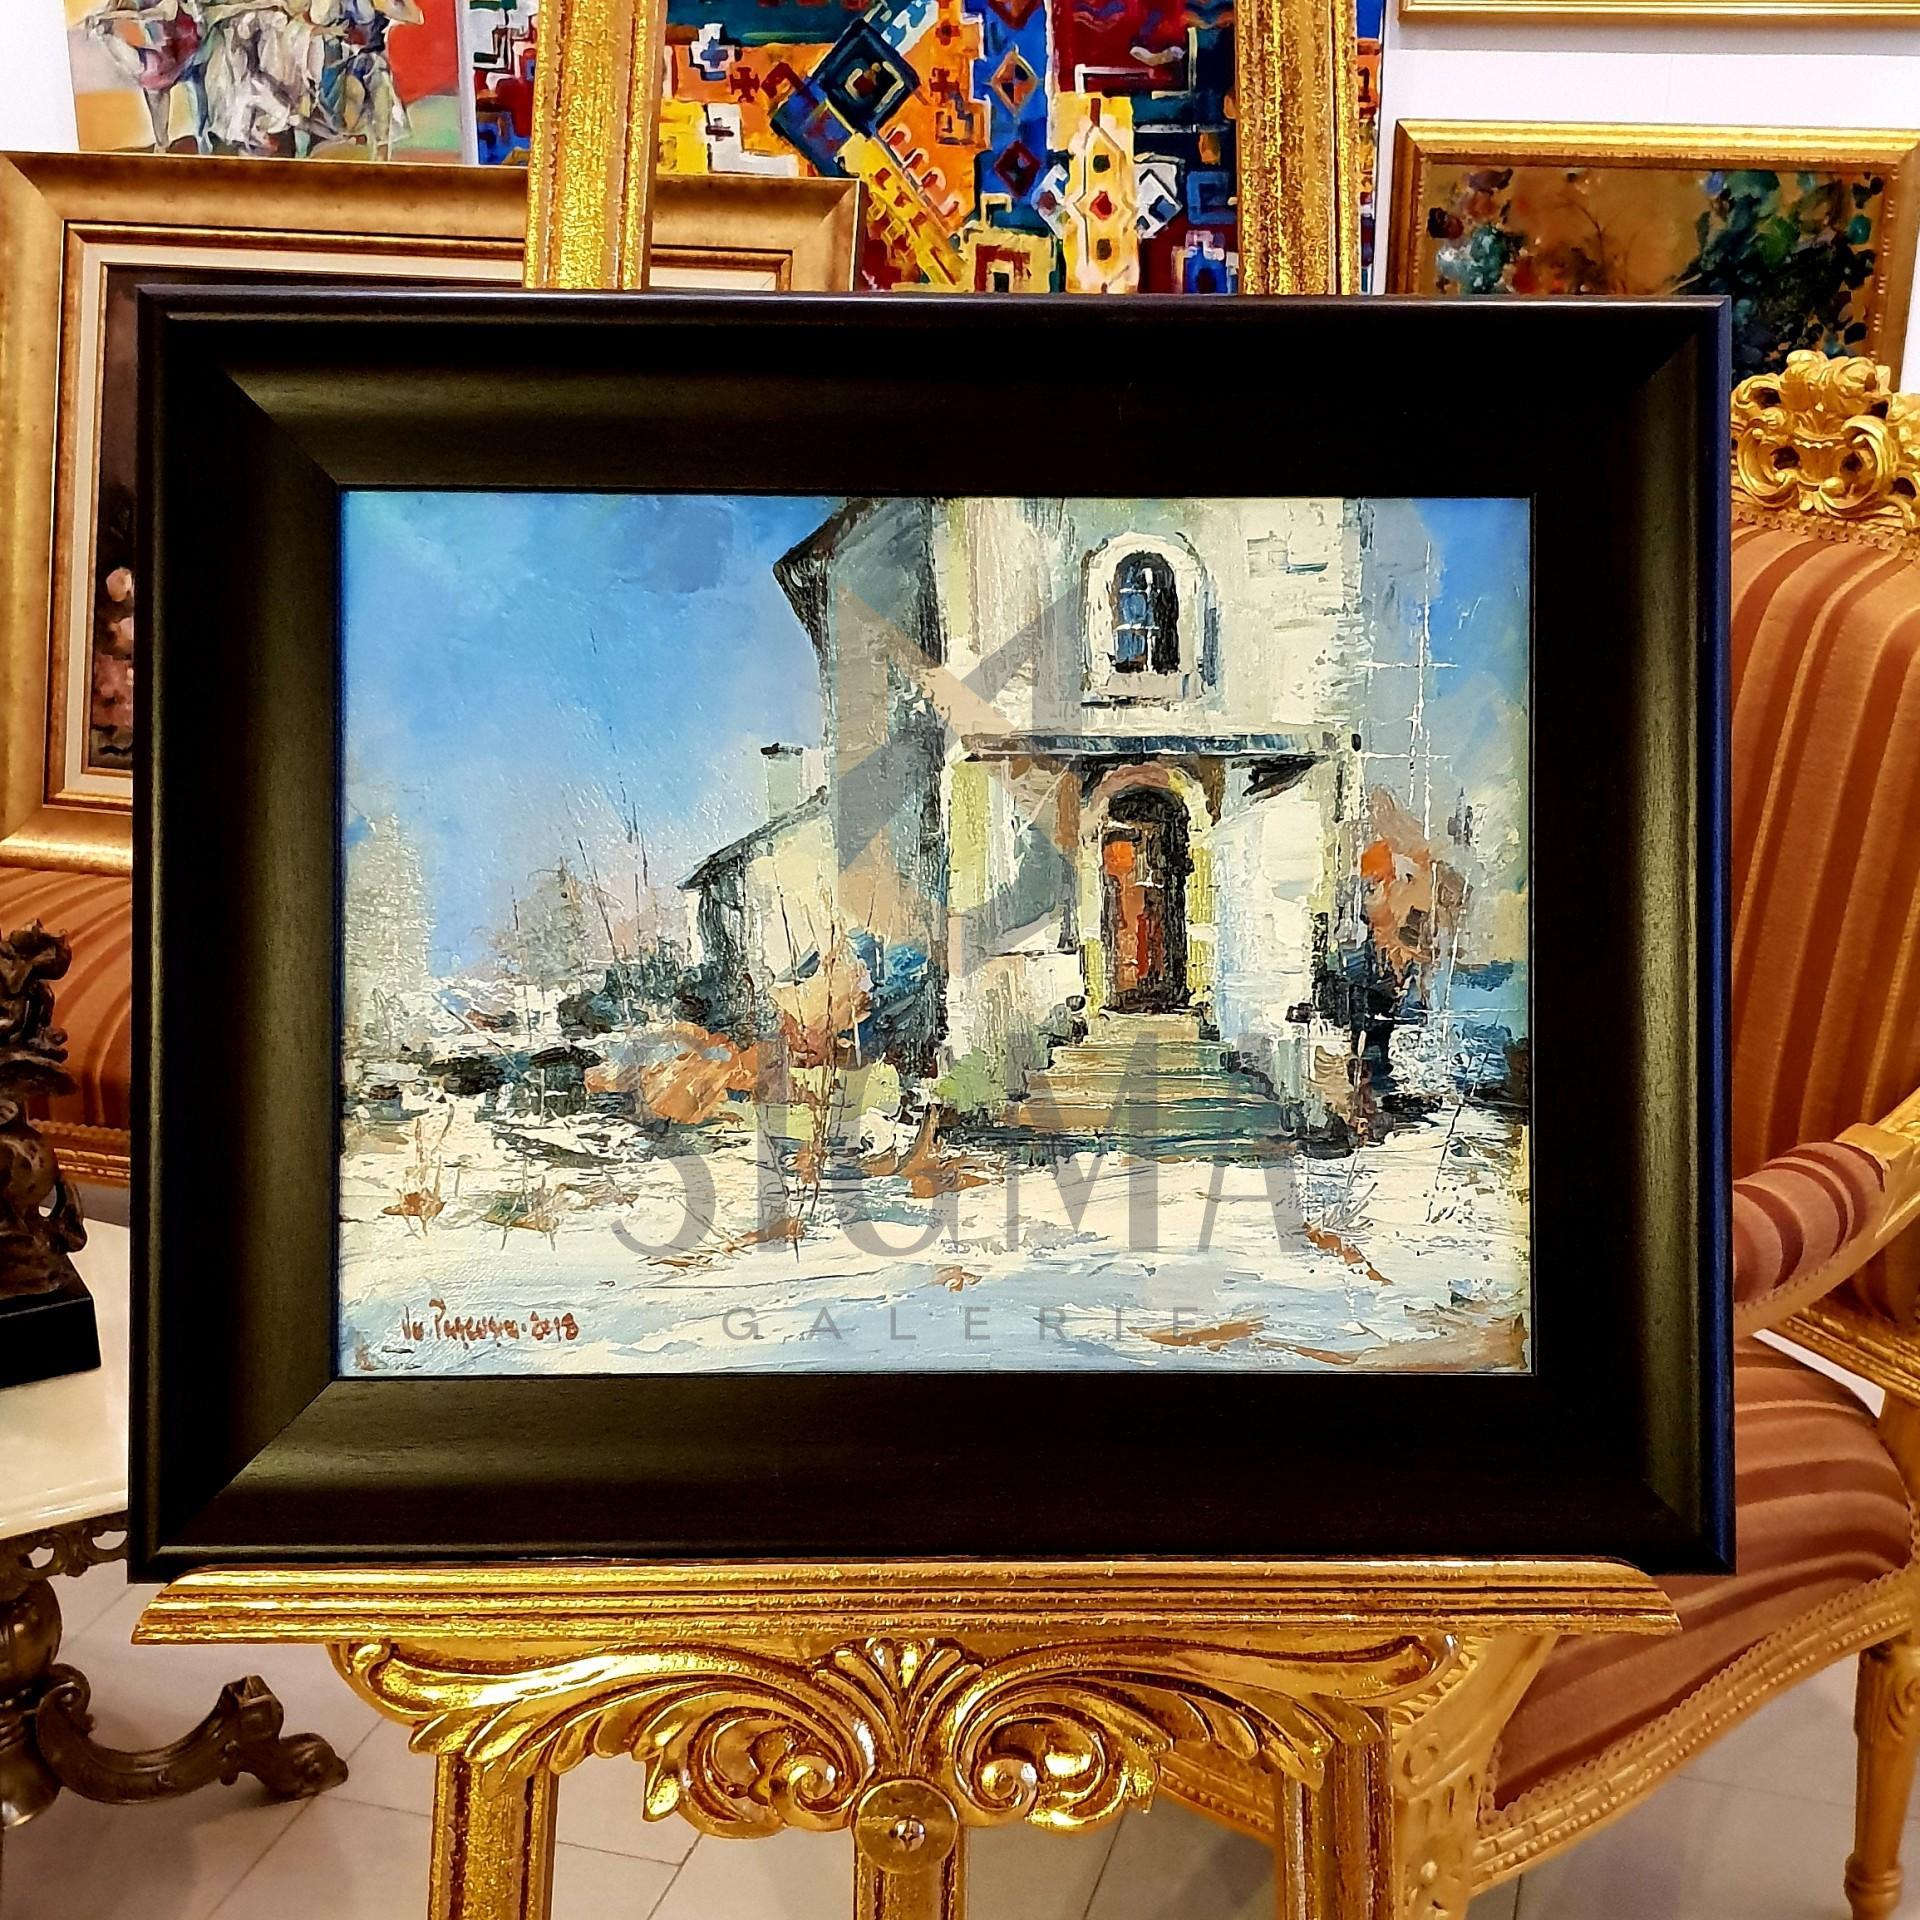 "Tablou, ""Intrarea in biserica"", Autor: Ovidiu Puscasiu, Ulei pe panza, 30 x 40 cm"